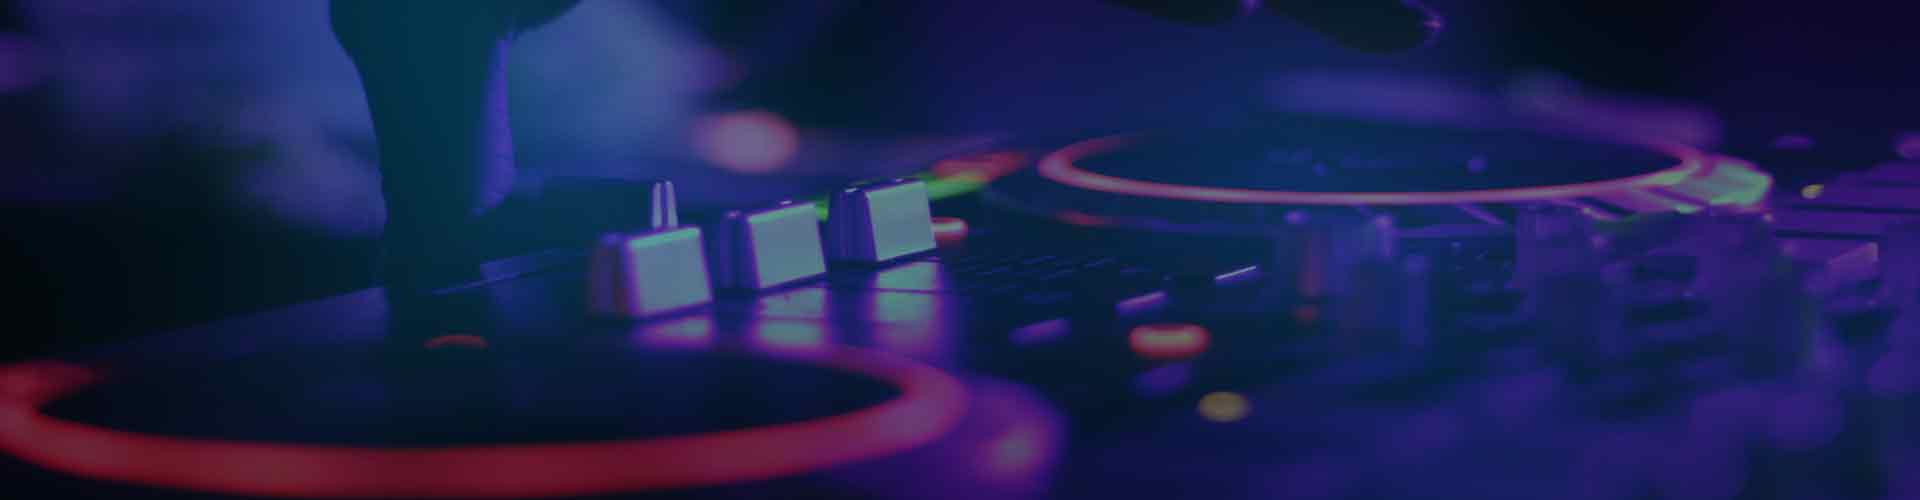 eddieb-dj-entertainment-background3